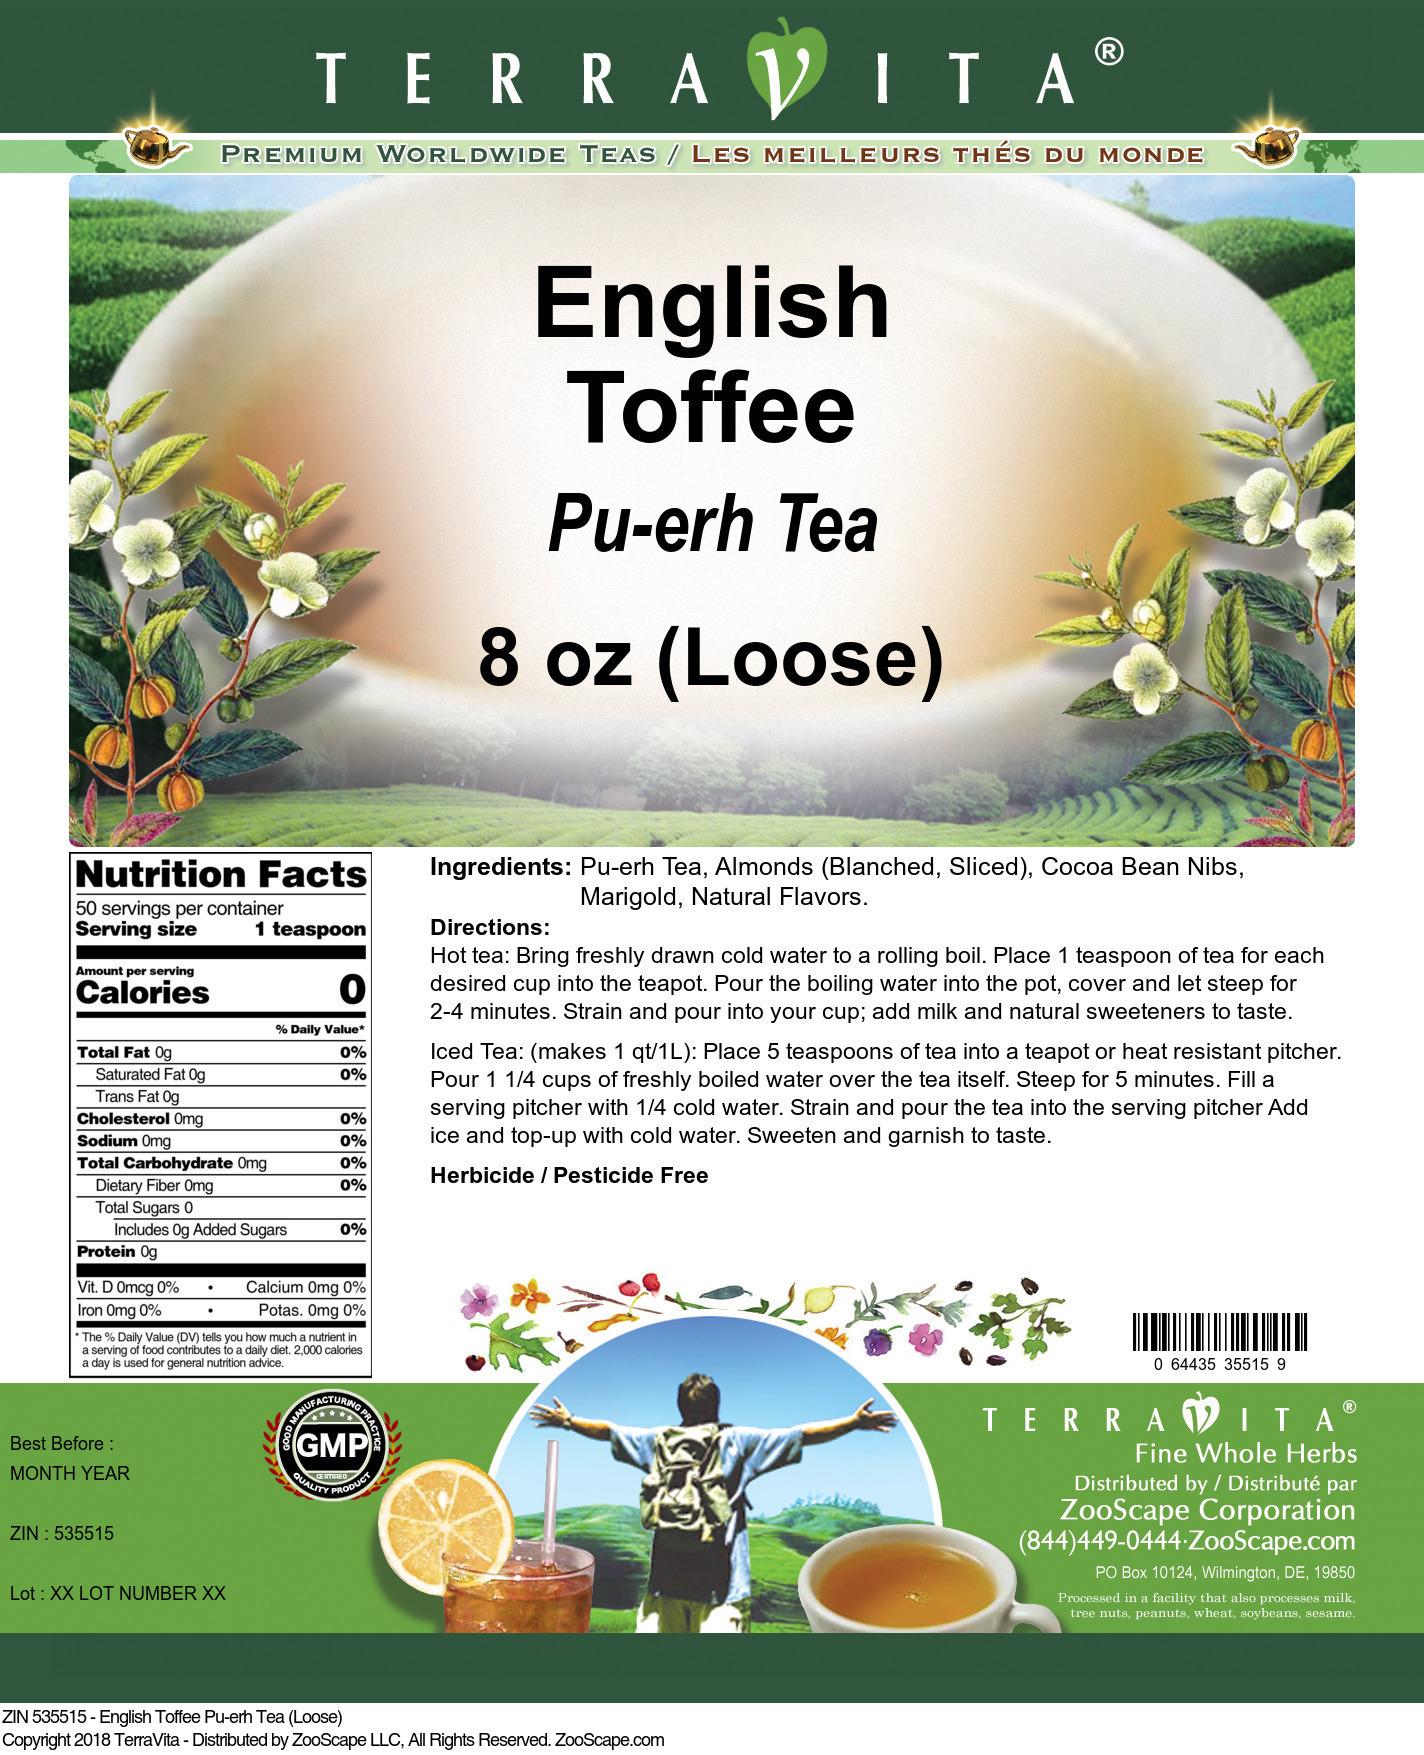 English Toffee Pu-erh Tea (Loose)